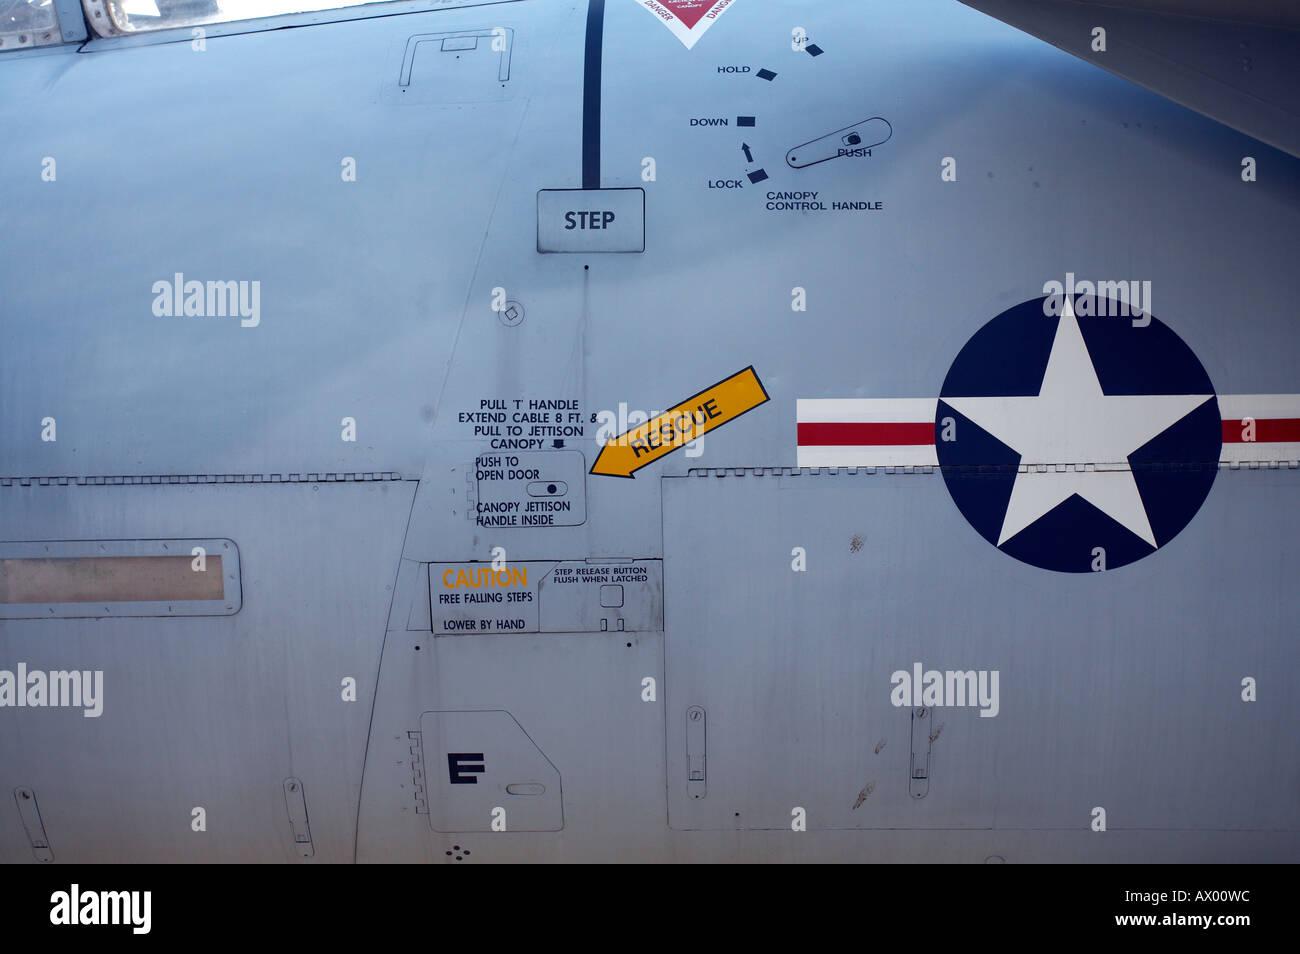 McDonnel Douglas F15 A  Eagle Close up of fuselage - Stock Image